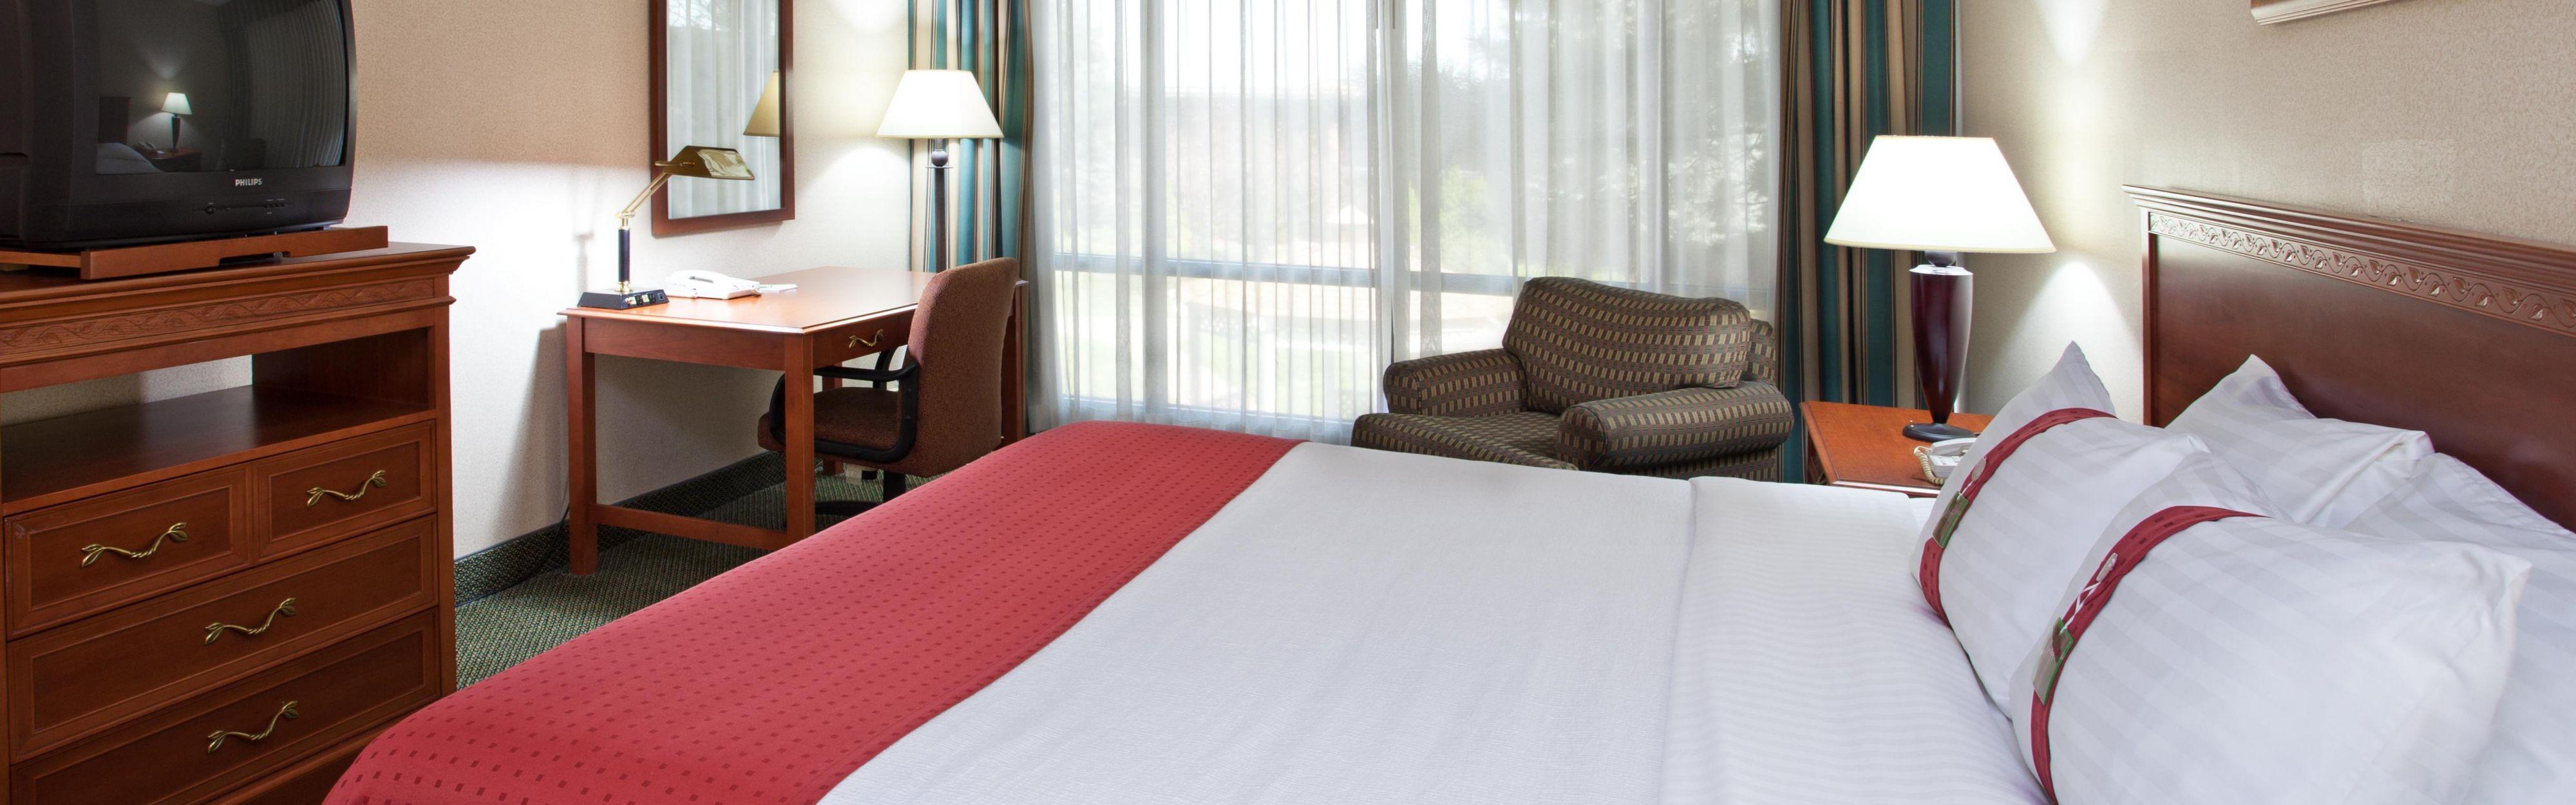 Holiday Inn Southgate (Detroit-South) image 1